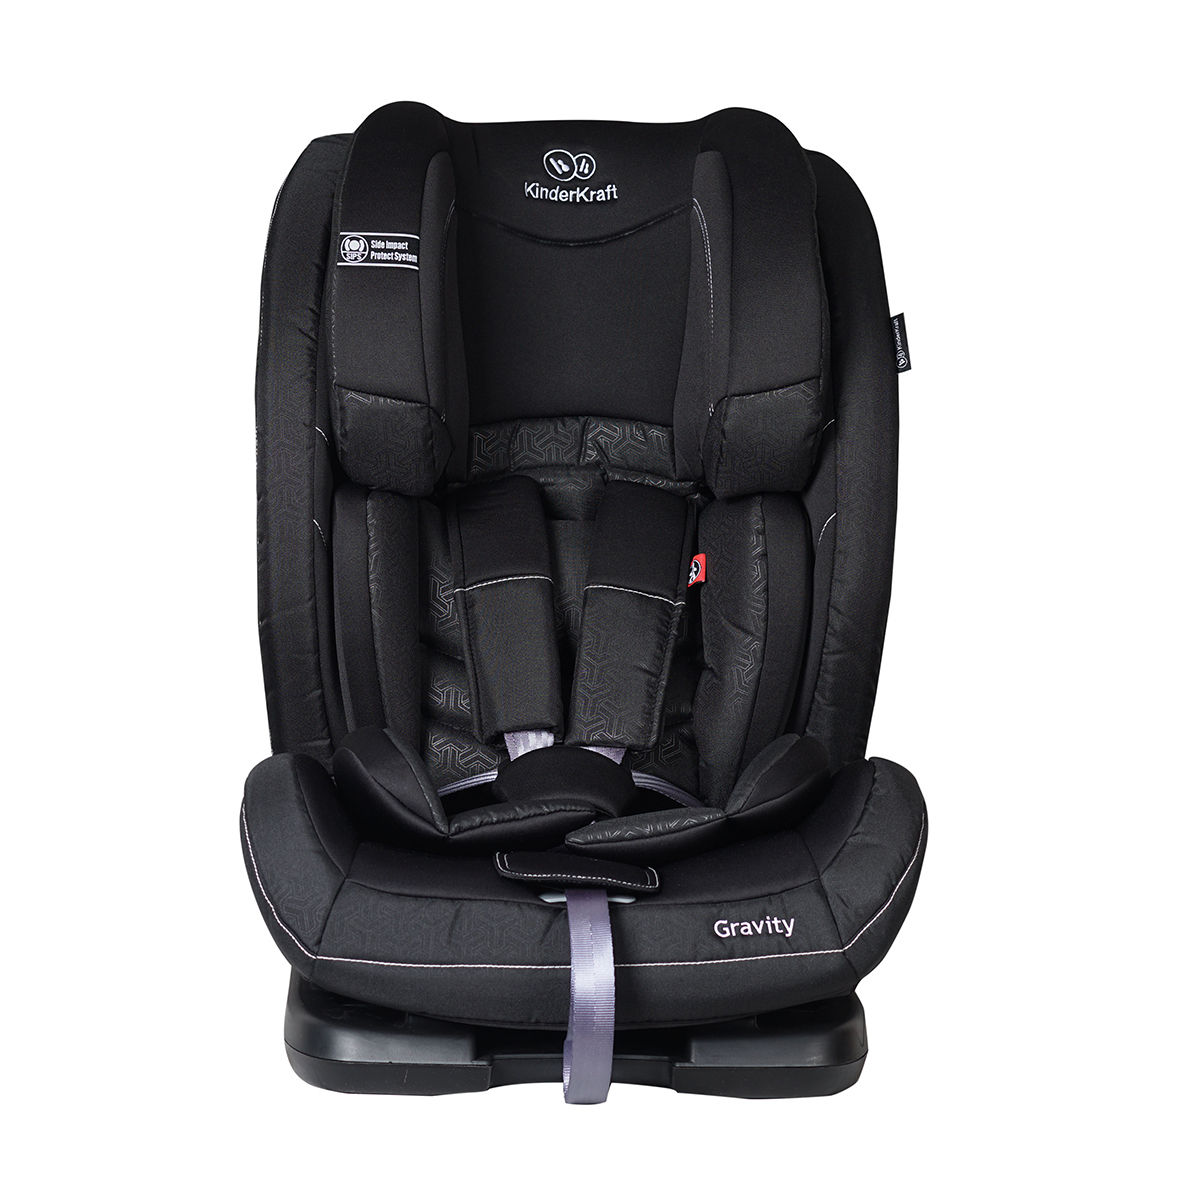 Kinder Autositz Gravity 9 36 Kg